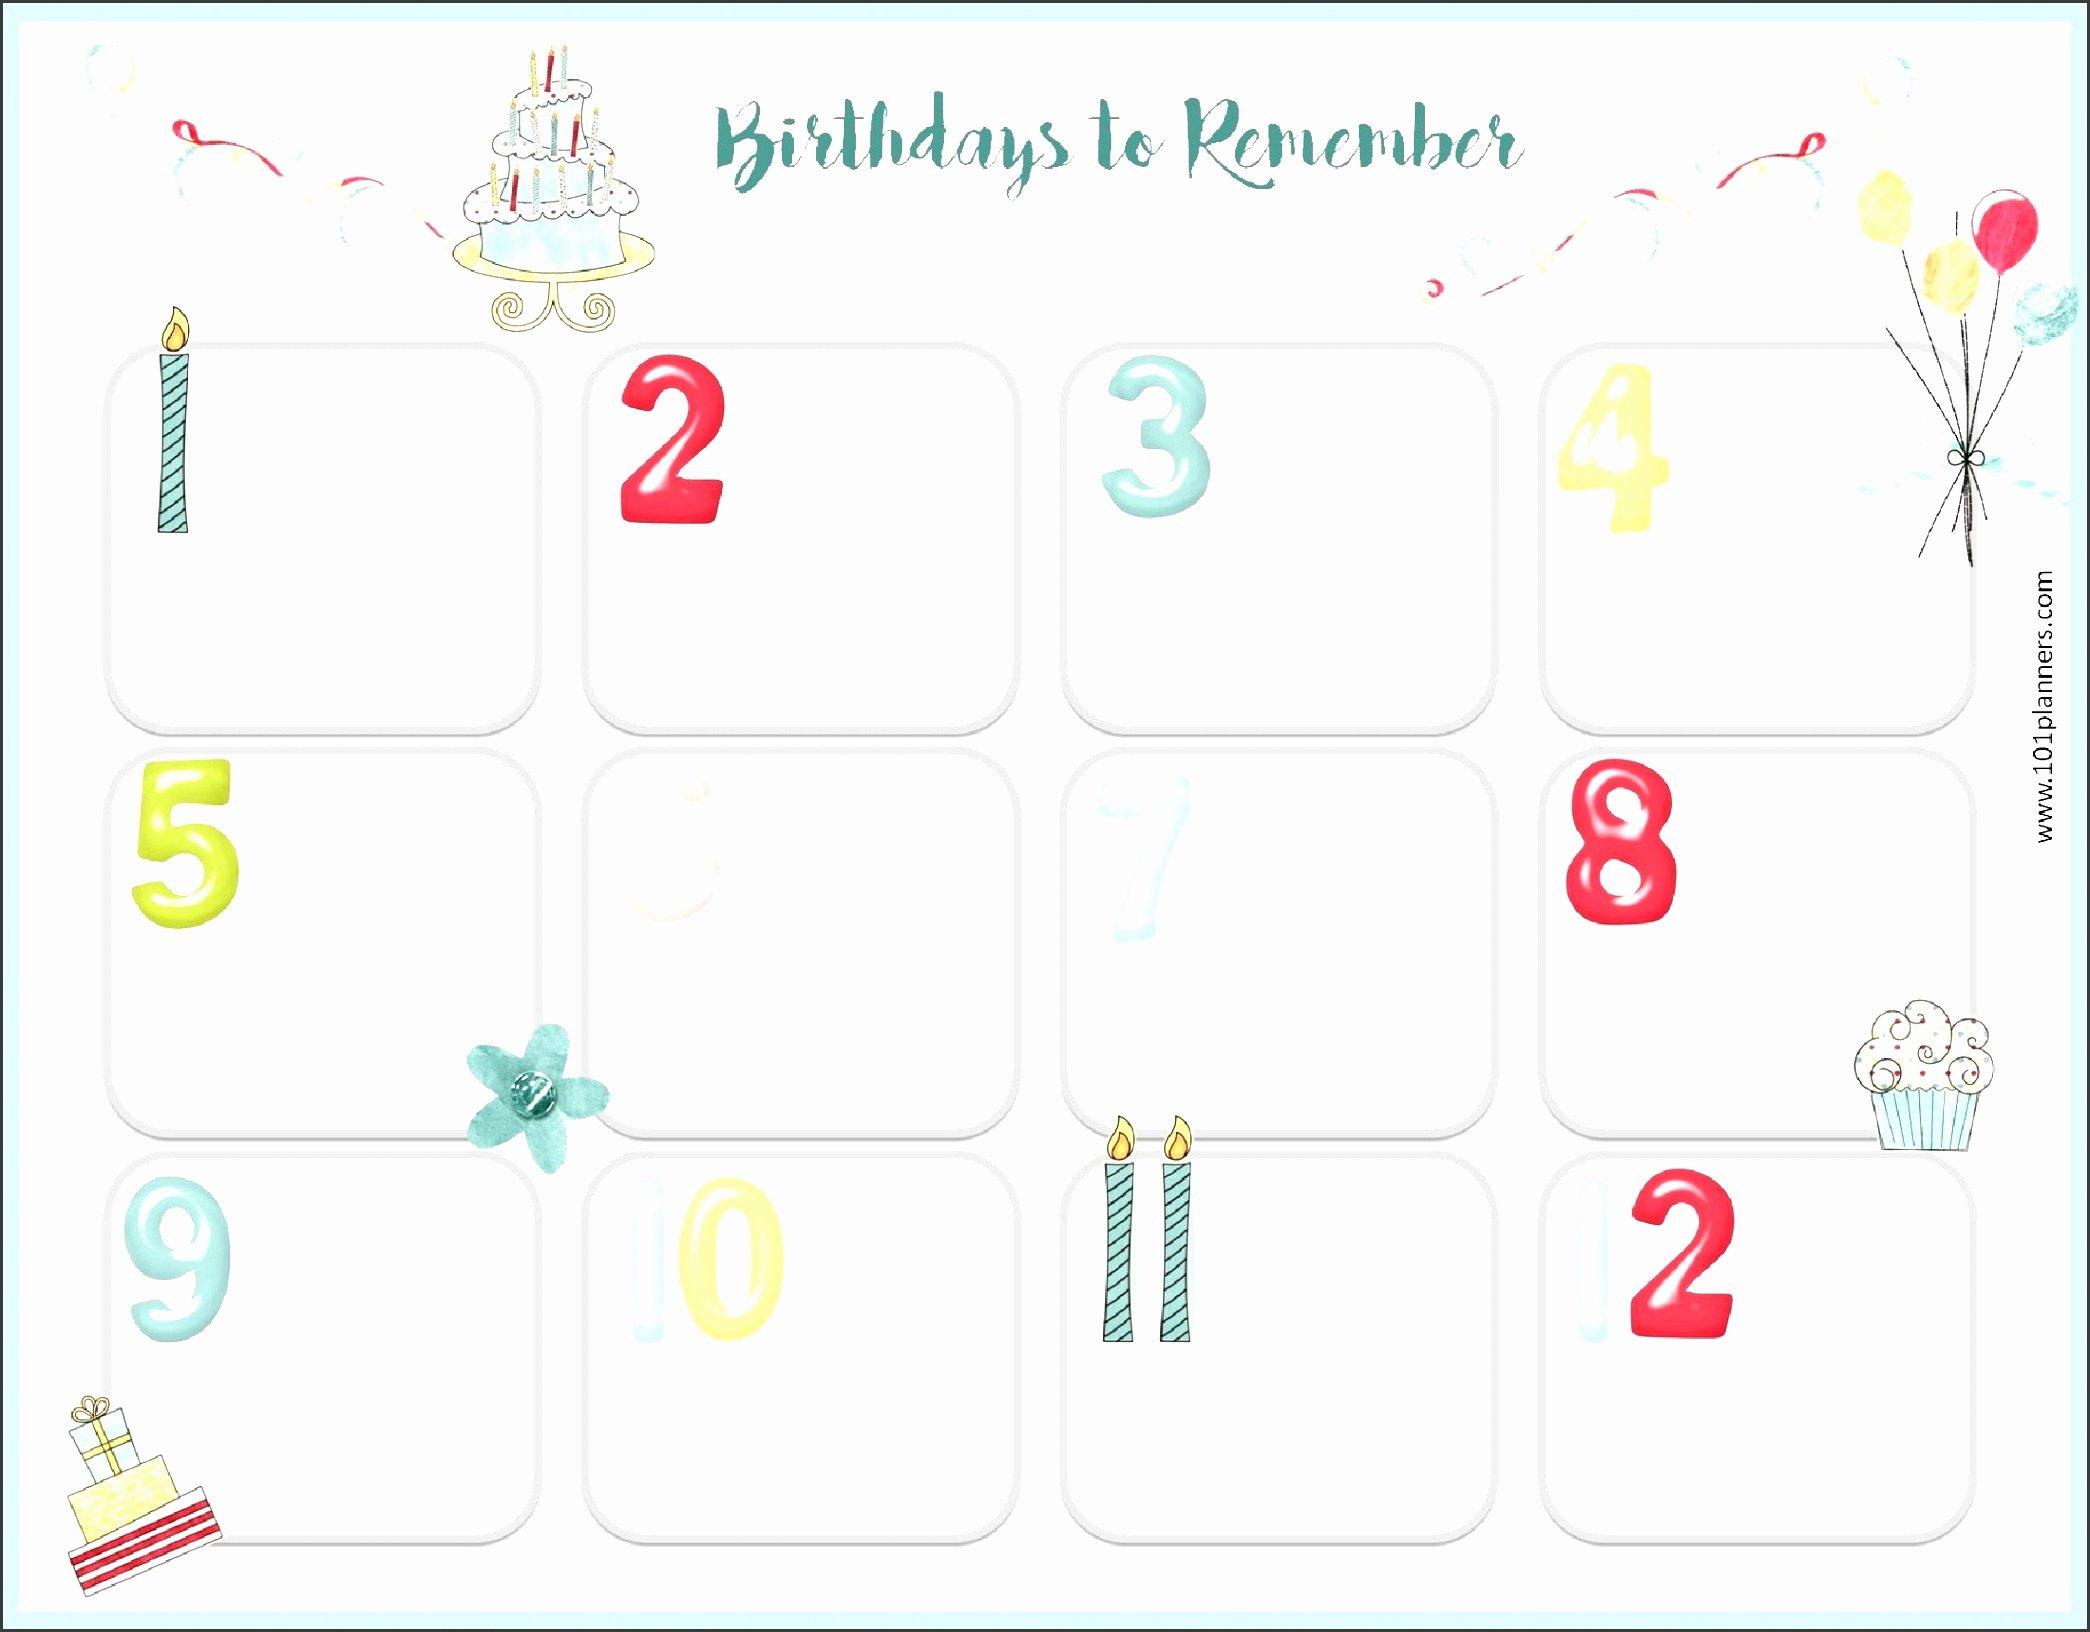 Employee Birthday List Template Elegant Birthday List Template Wish Word Editable Excel Guest Free